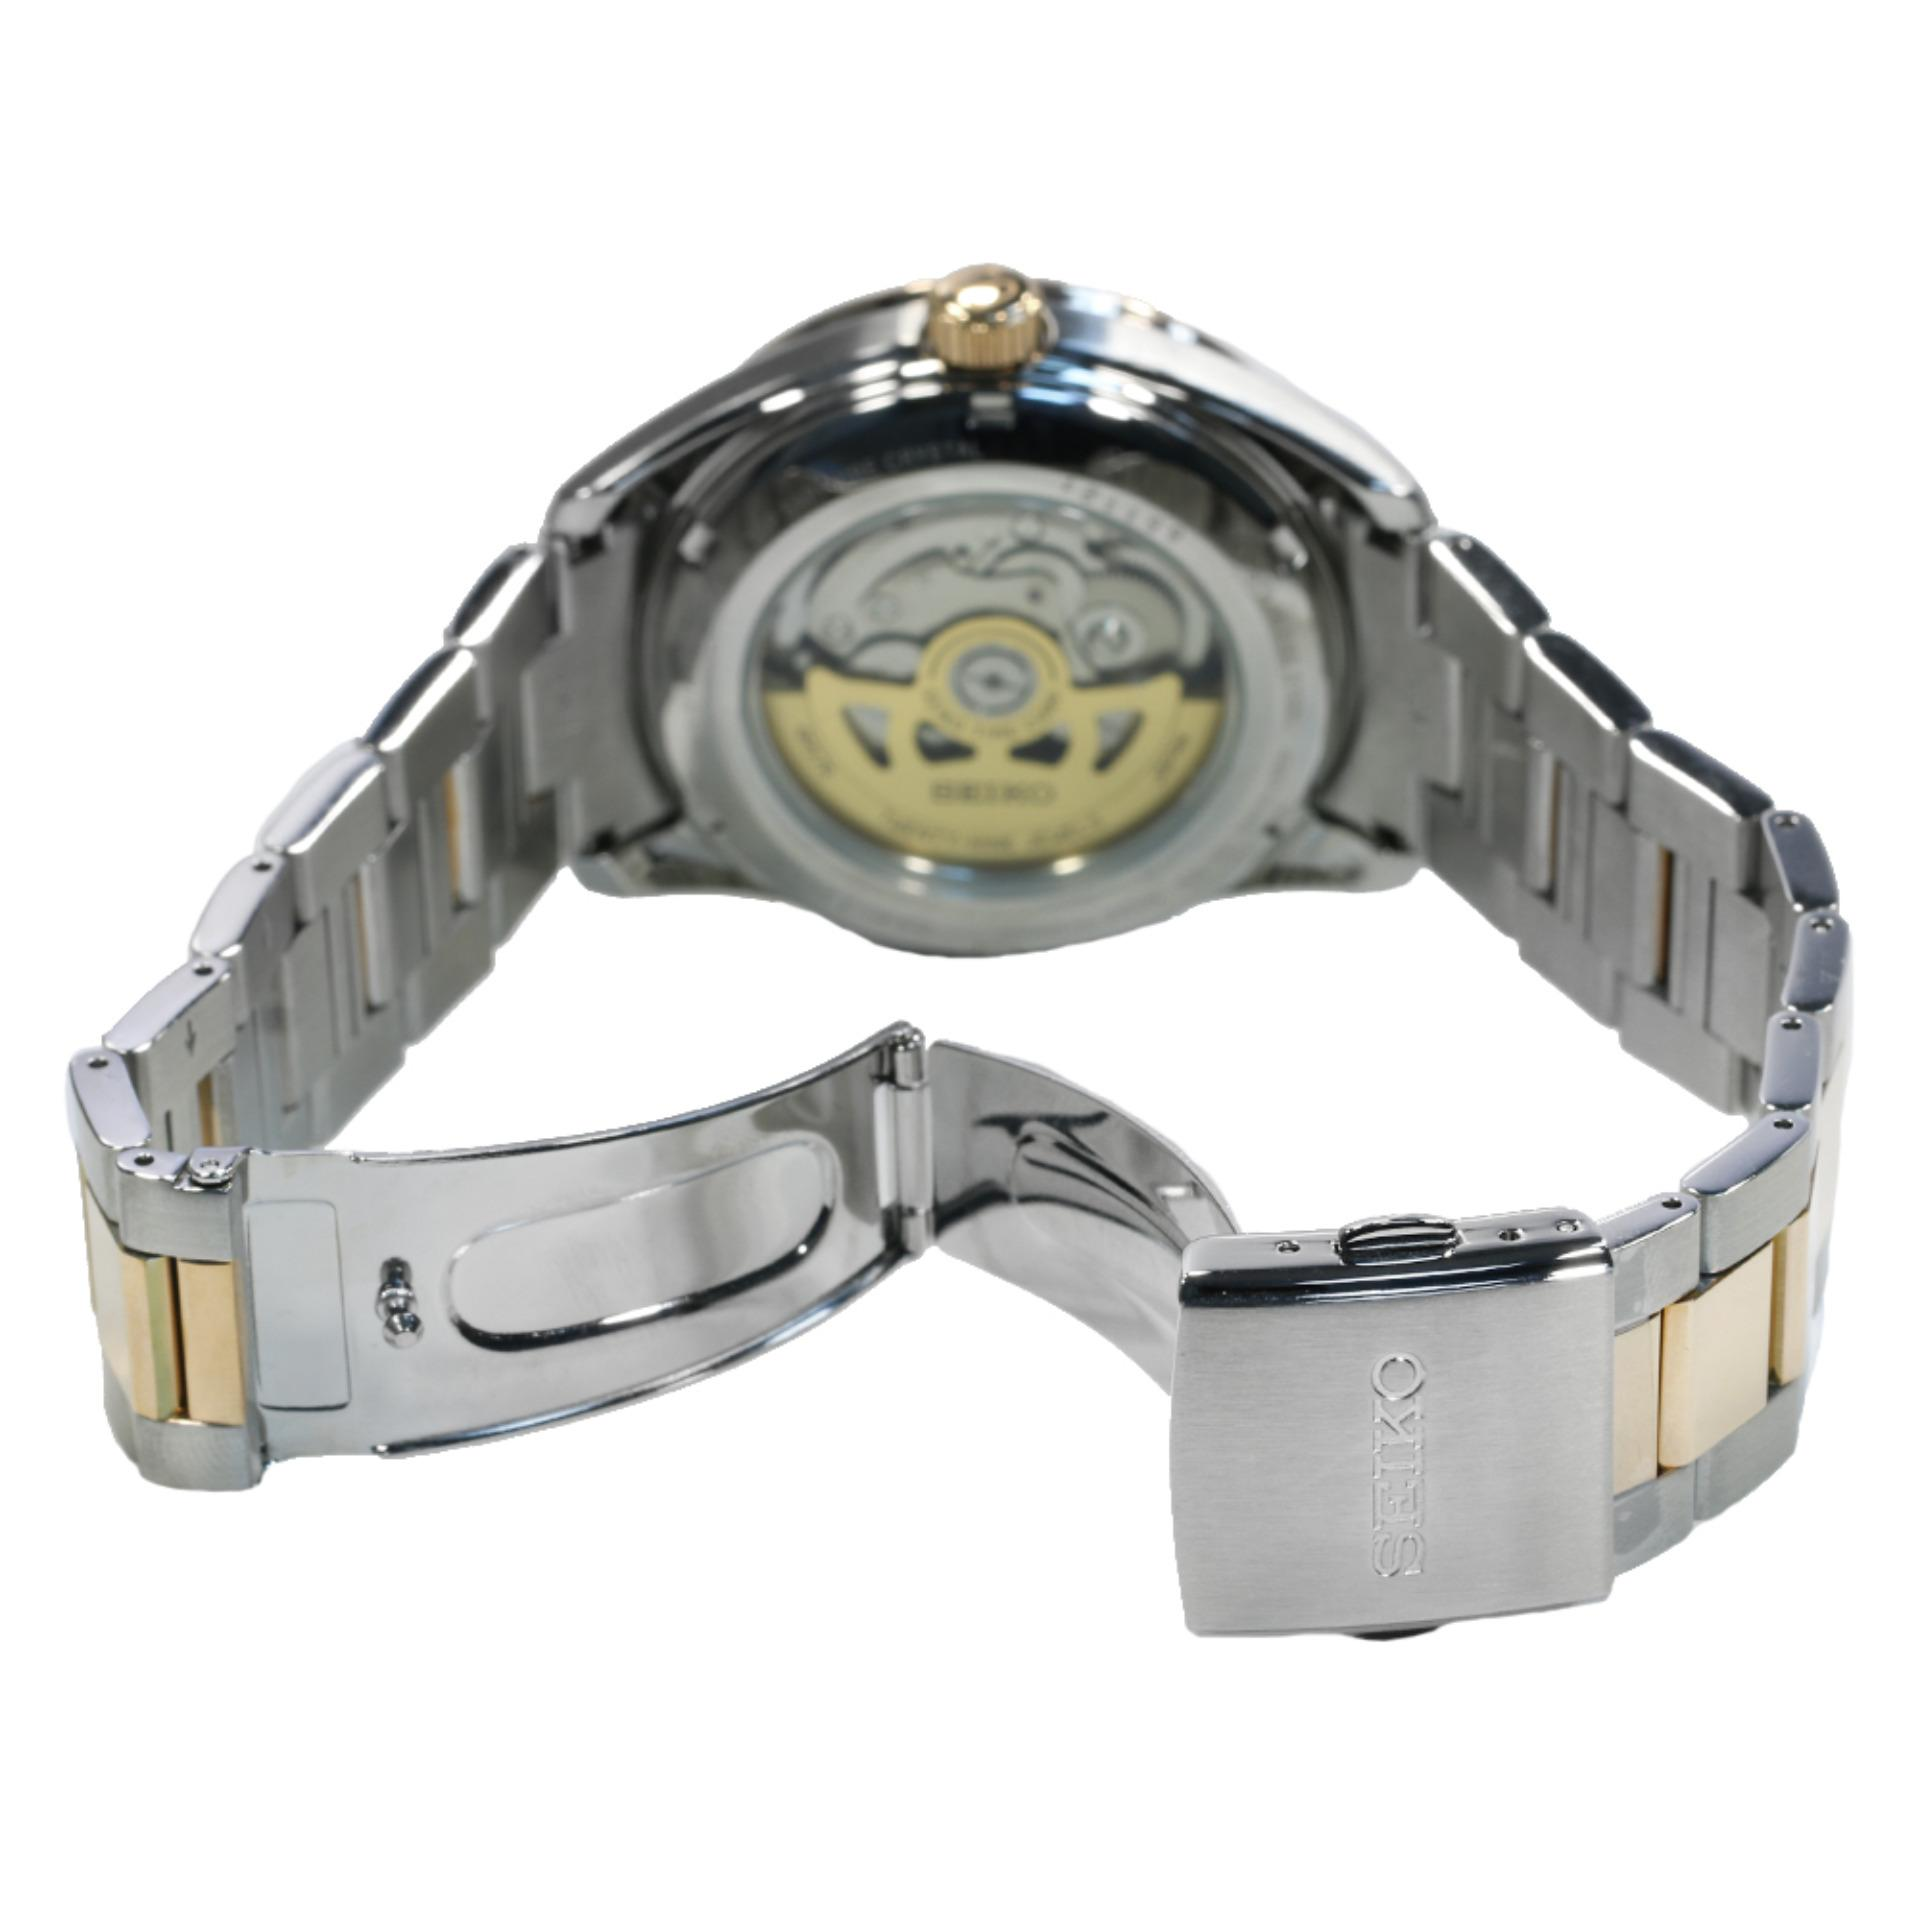 Seiko 5 Automatic Jam Tangan Tali Stainless Steel Black Srp489k1 Sport Srp487k1 Logam Silver Pria Presage Strap Stell Ssa308j1